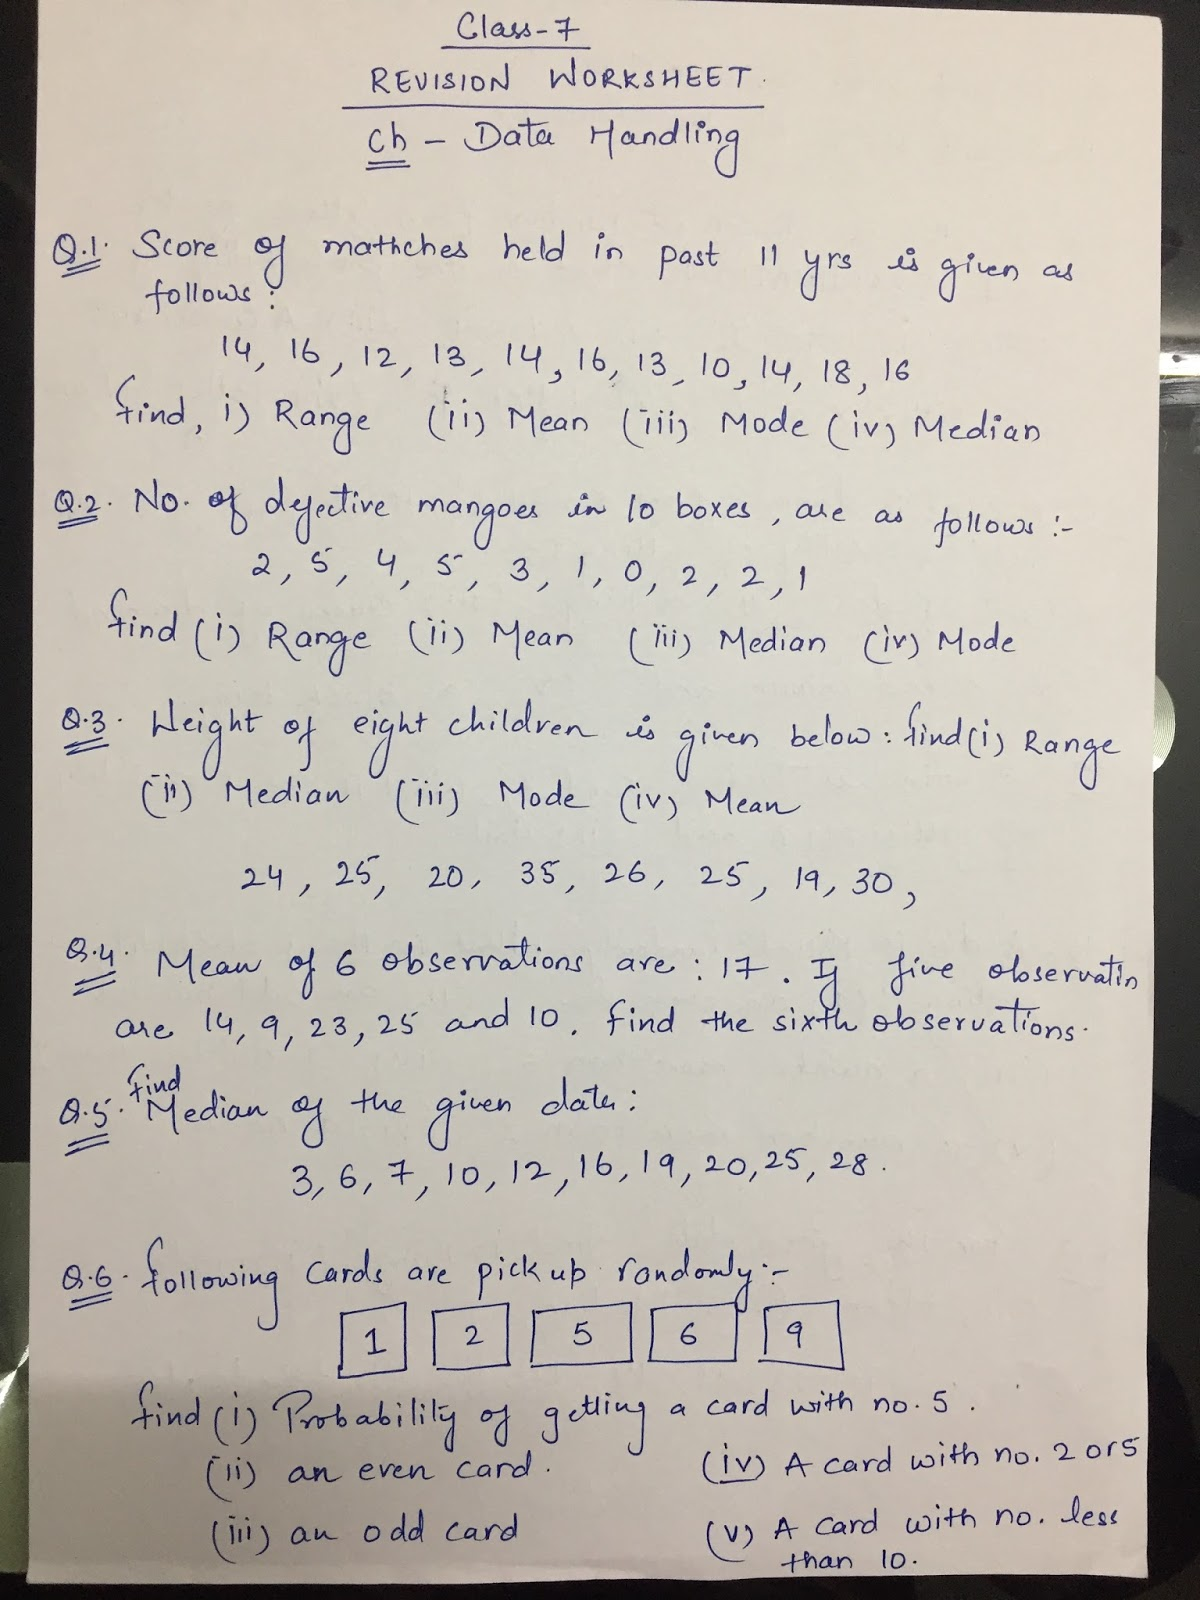 APS, Golconda | Priyanka Gupta: CLASS 7 / MATHS / REVISION WORKSHEET ...